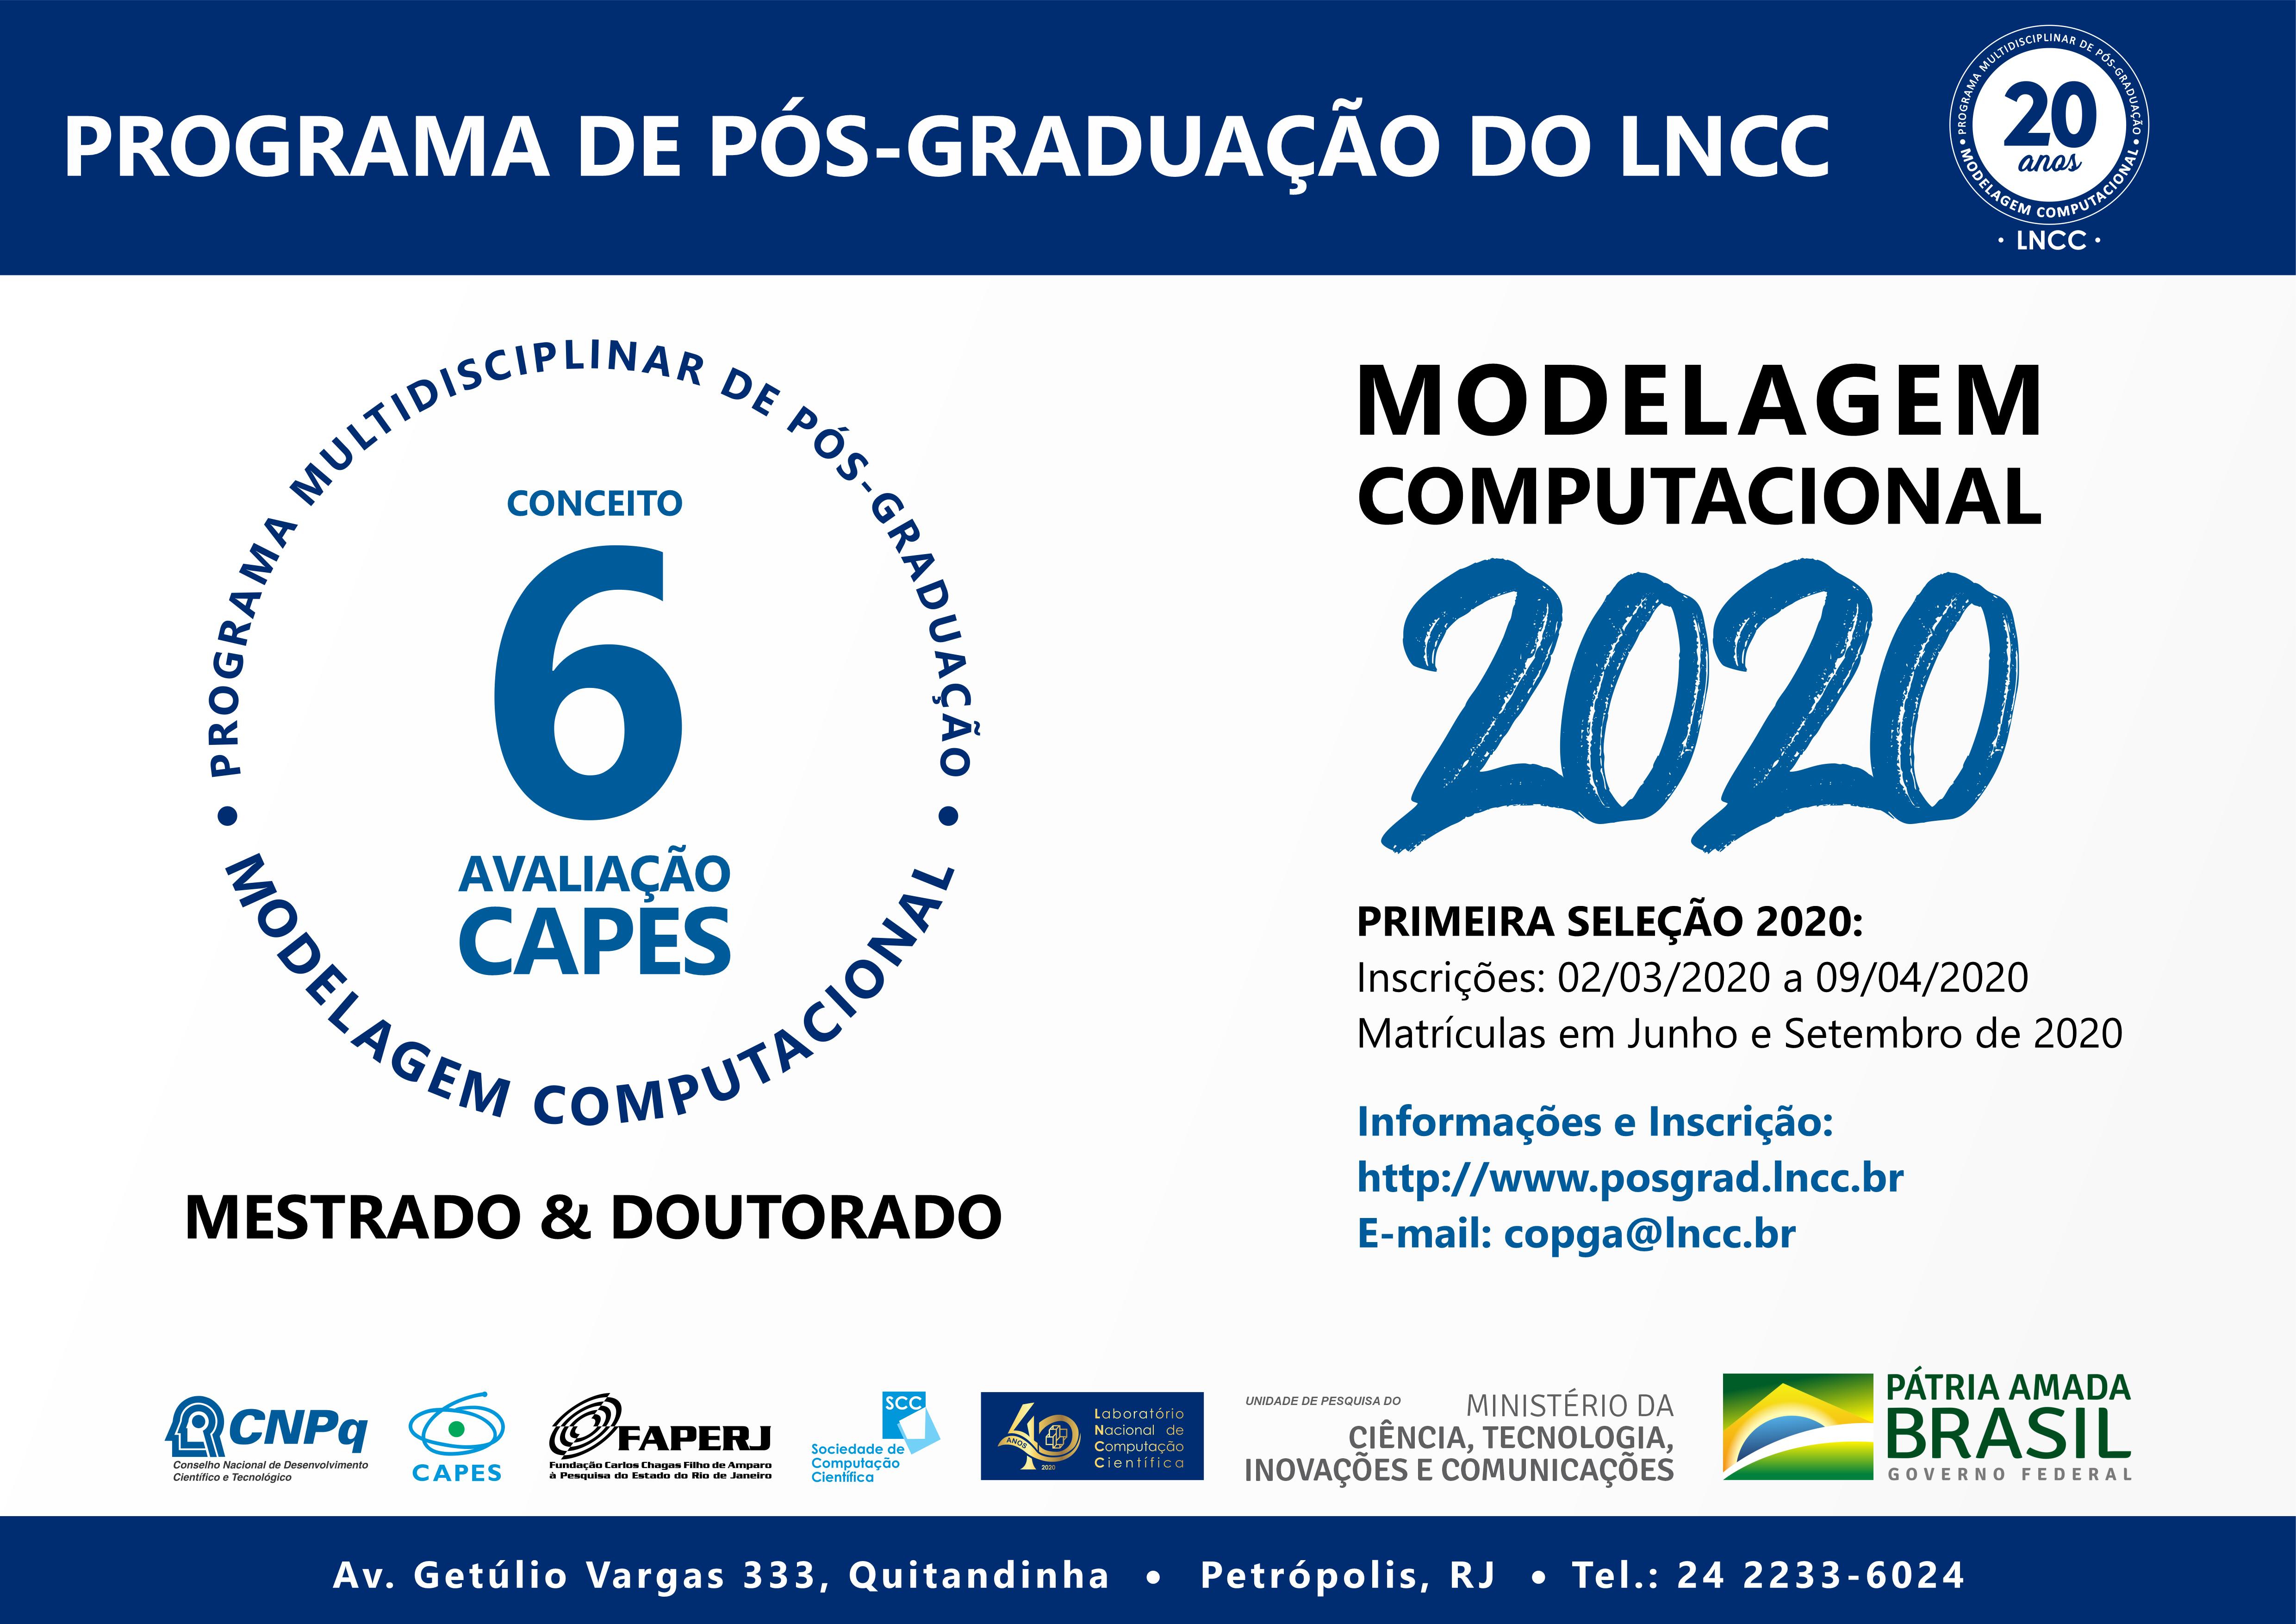 Cartaz  MODELAGEM COMPUTACIONAL 2020 02.png (1.02 MB)